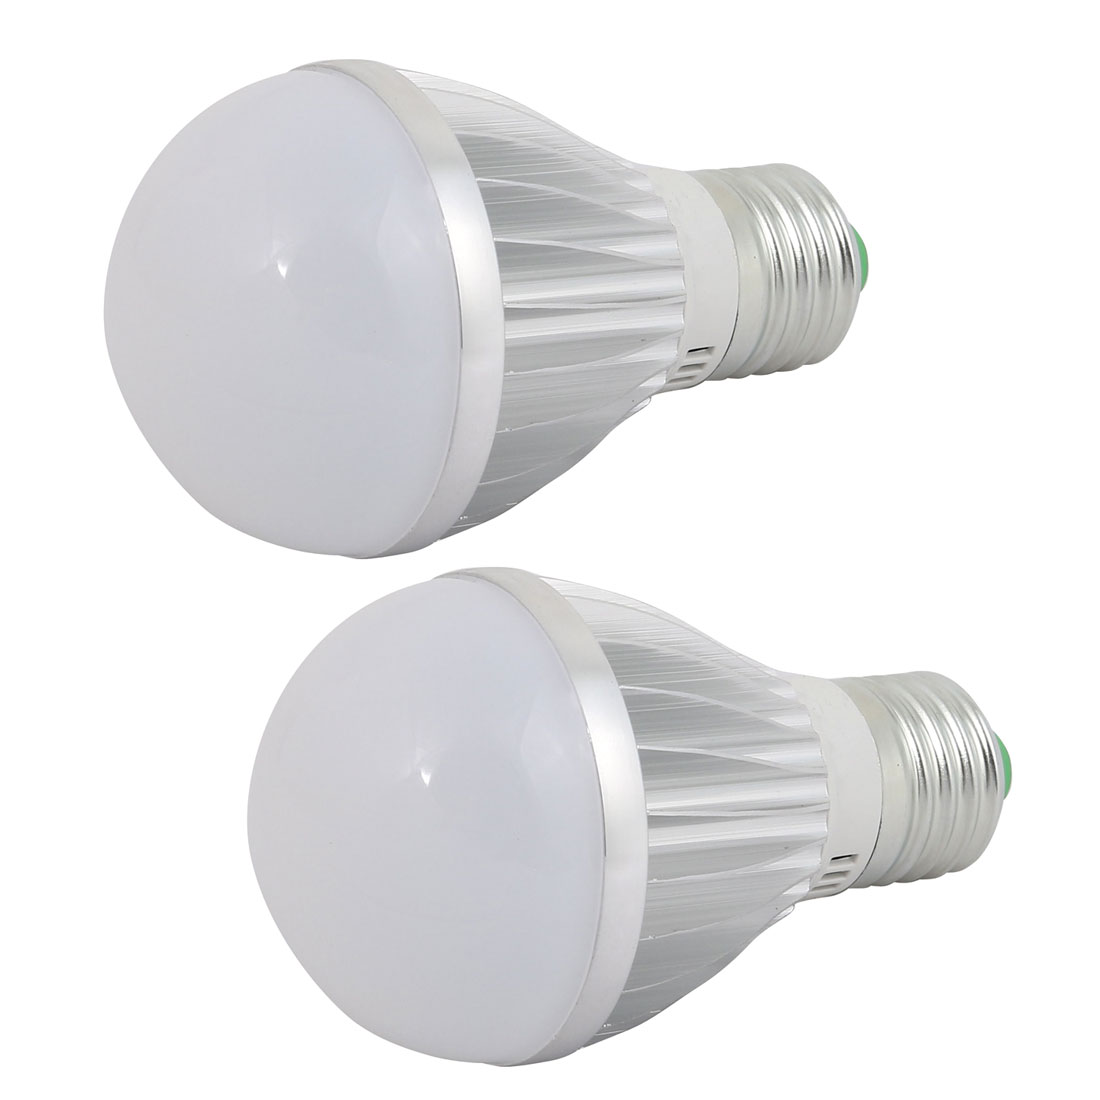 2 Pcs 5W Silver Aluminum Ball - Bulb Lamp Housing E27 Screw Base w White Cover